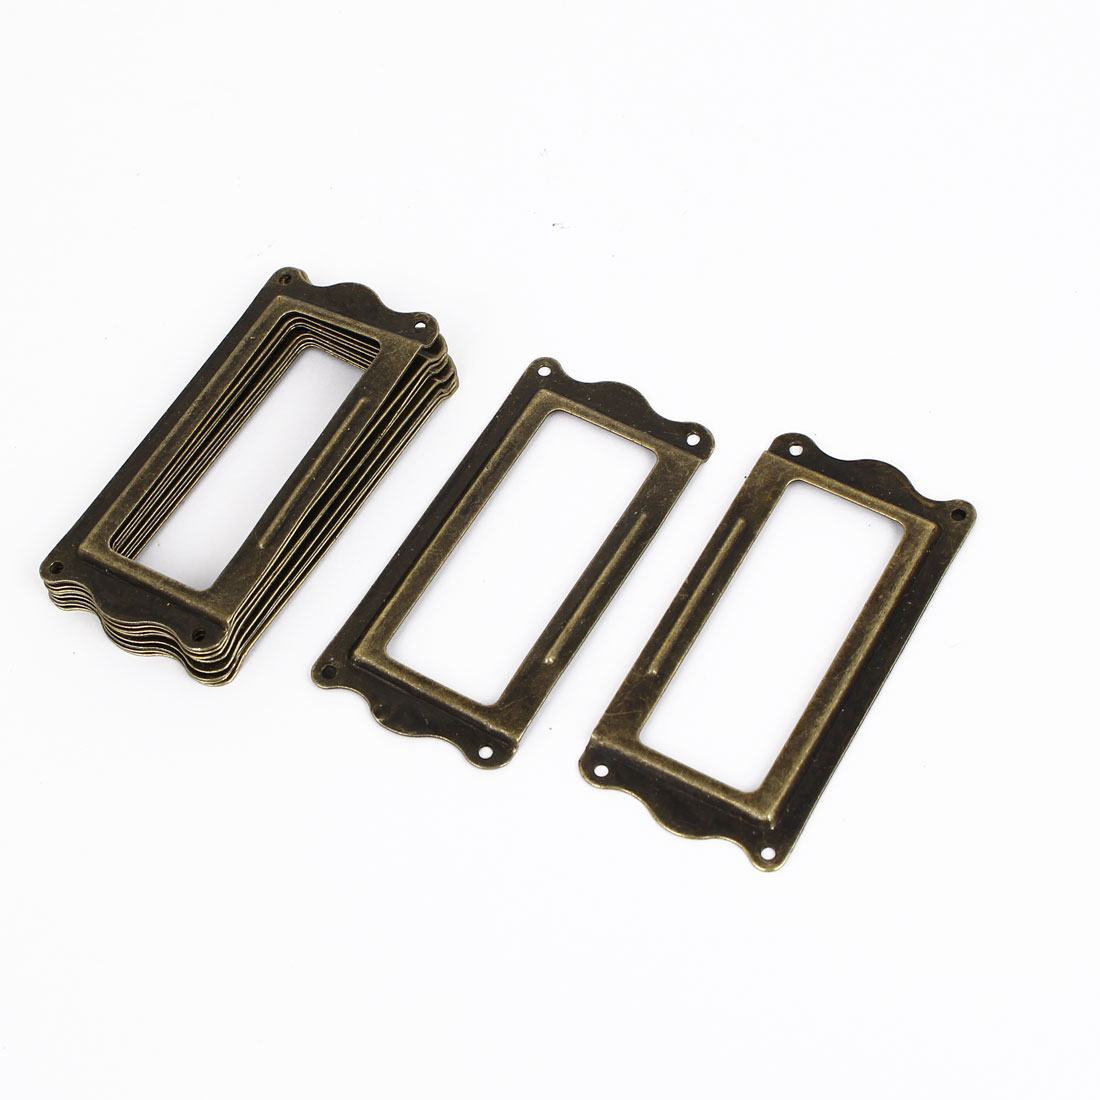 64mmx31mm Office Drawer Cabinet Label Pull Holder Frame 10pcs